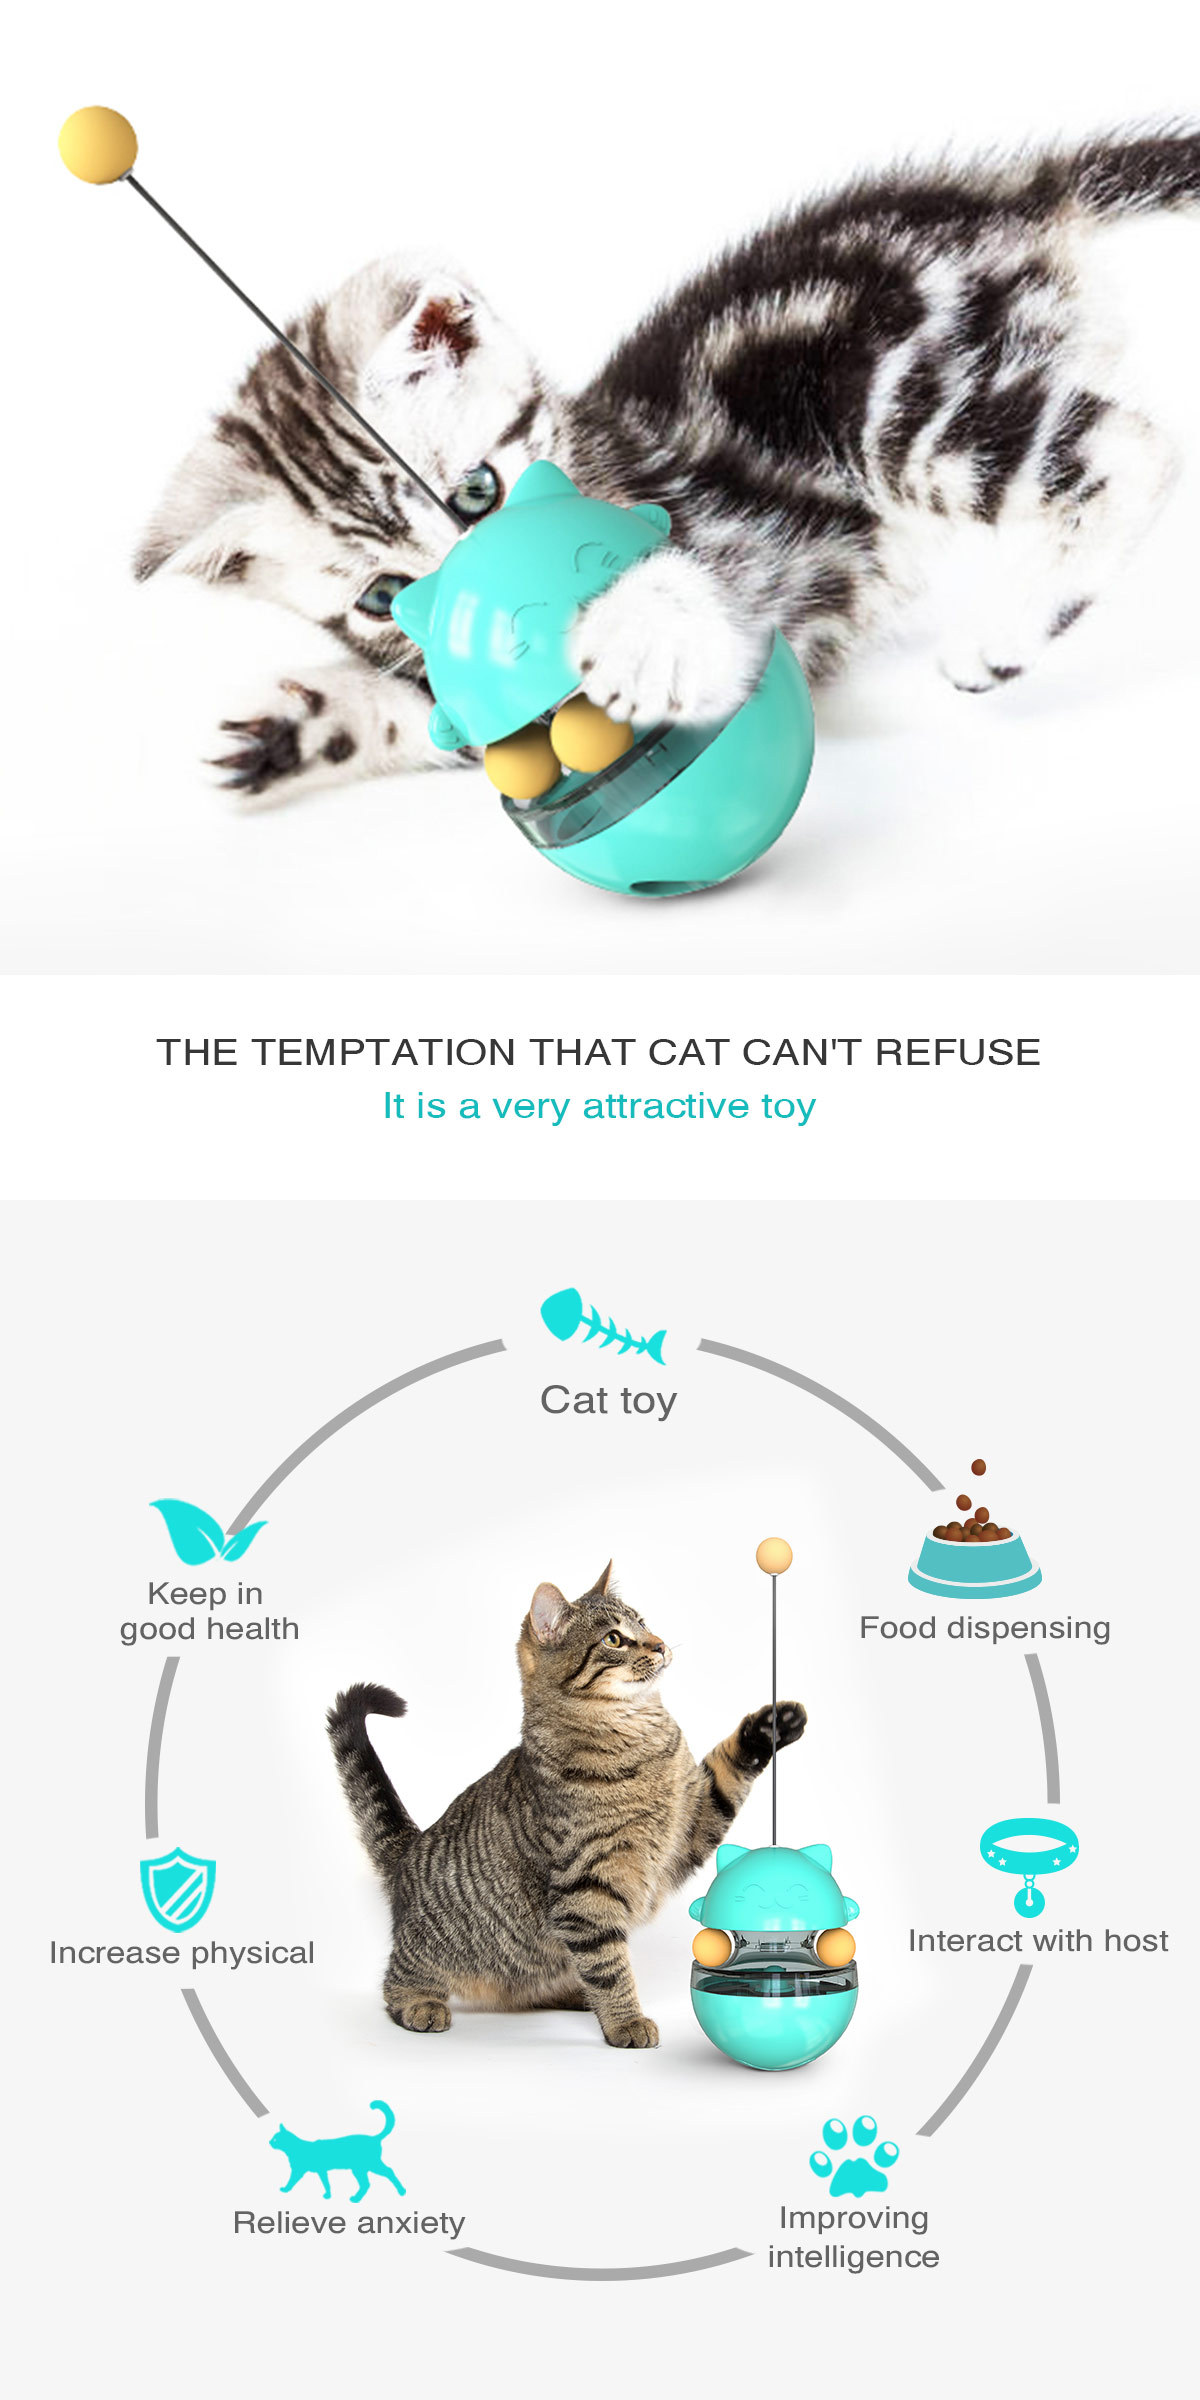 Pet Supplies Shake Cat Toy Teasing Cat Stick Teasing Artifact Track Ball Does Not Spill Food Ball MOQ 30 PCS 3